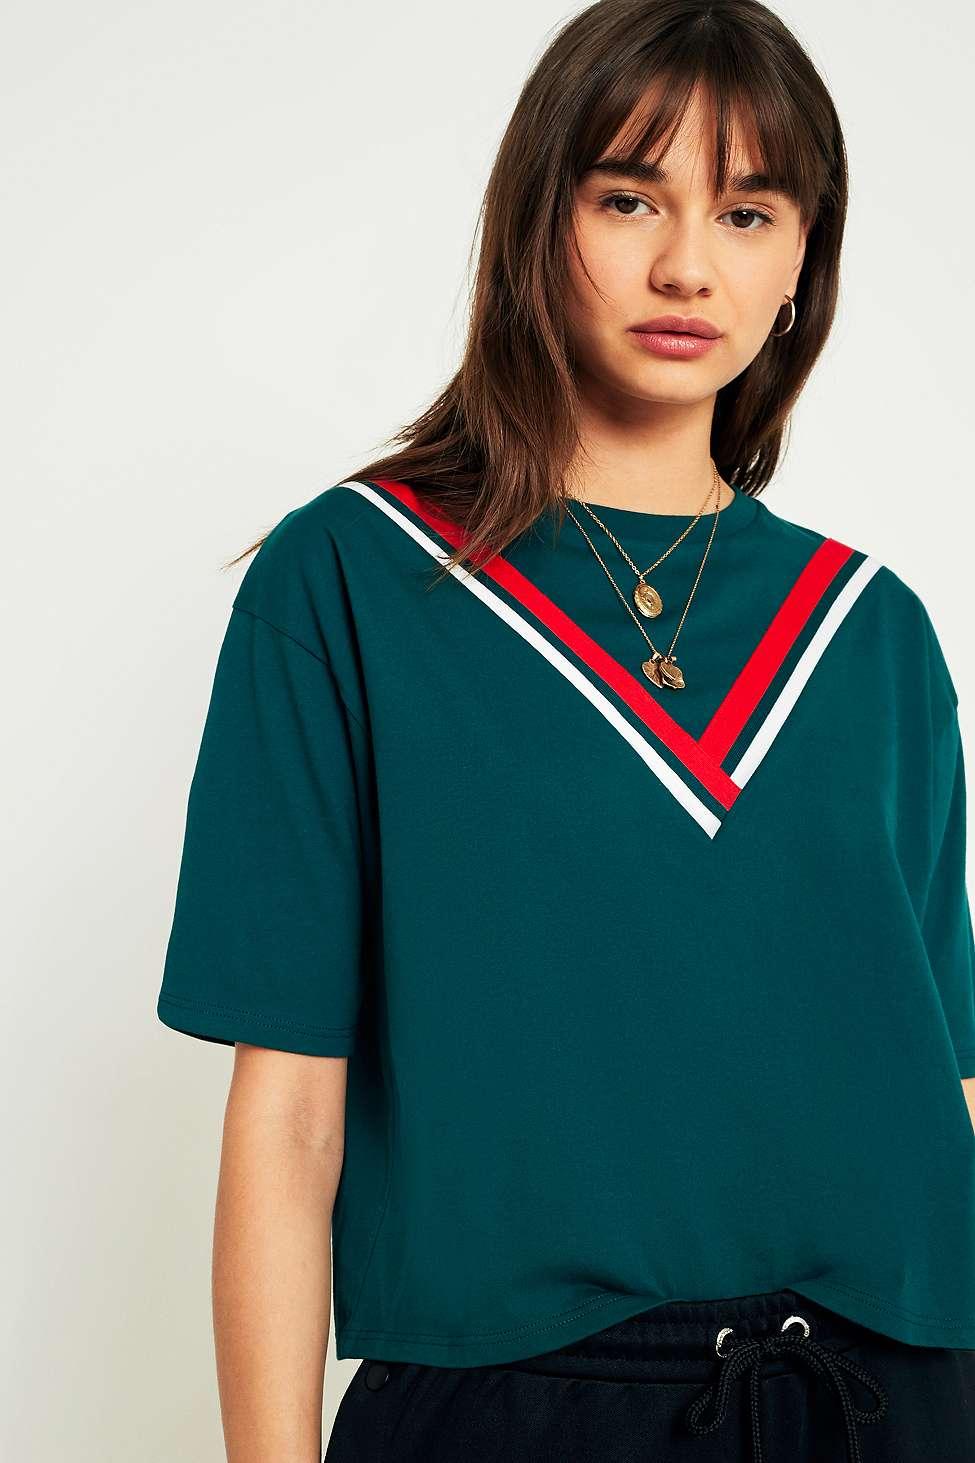 Urban Outfitters Short-Sleeve Chevron T-Shirt, Green